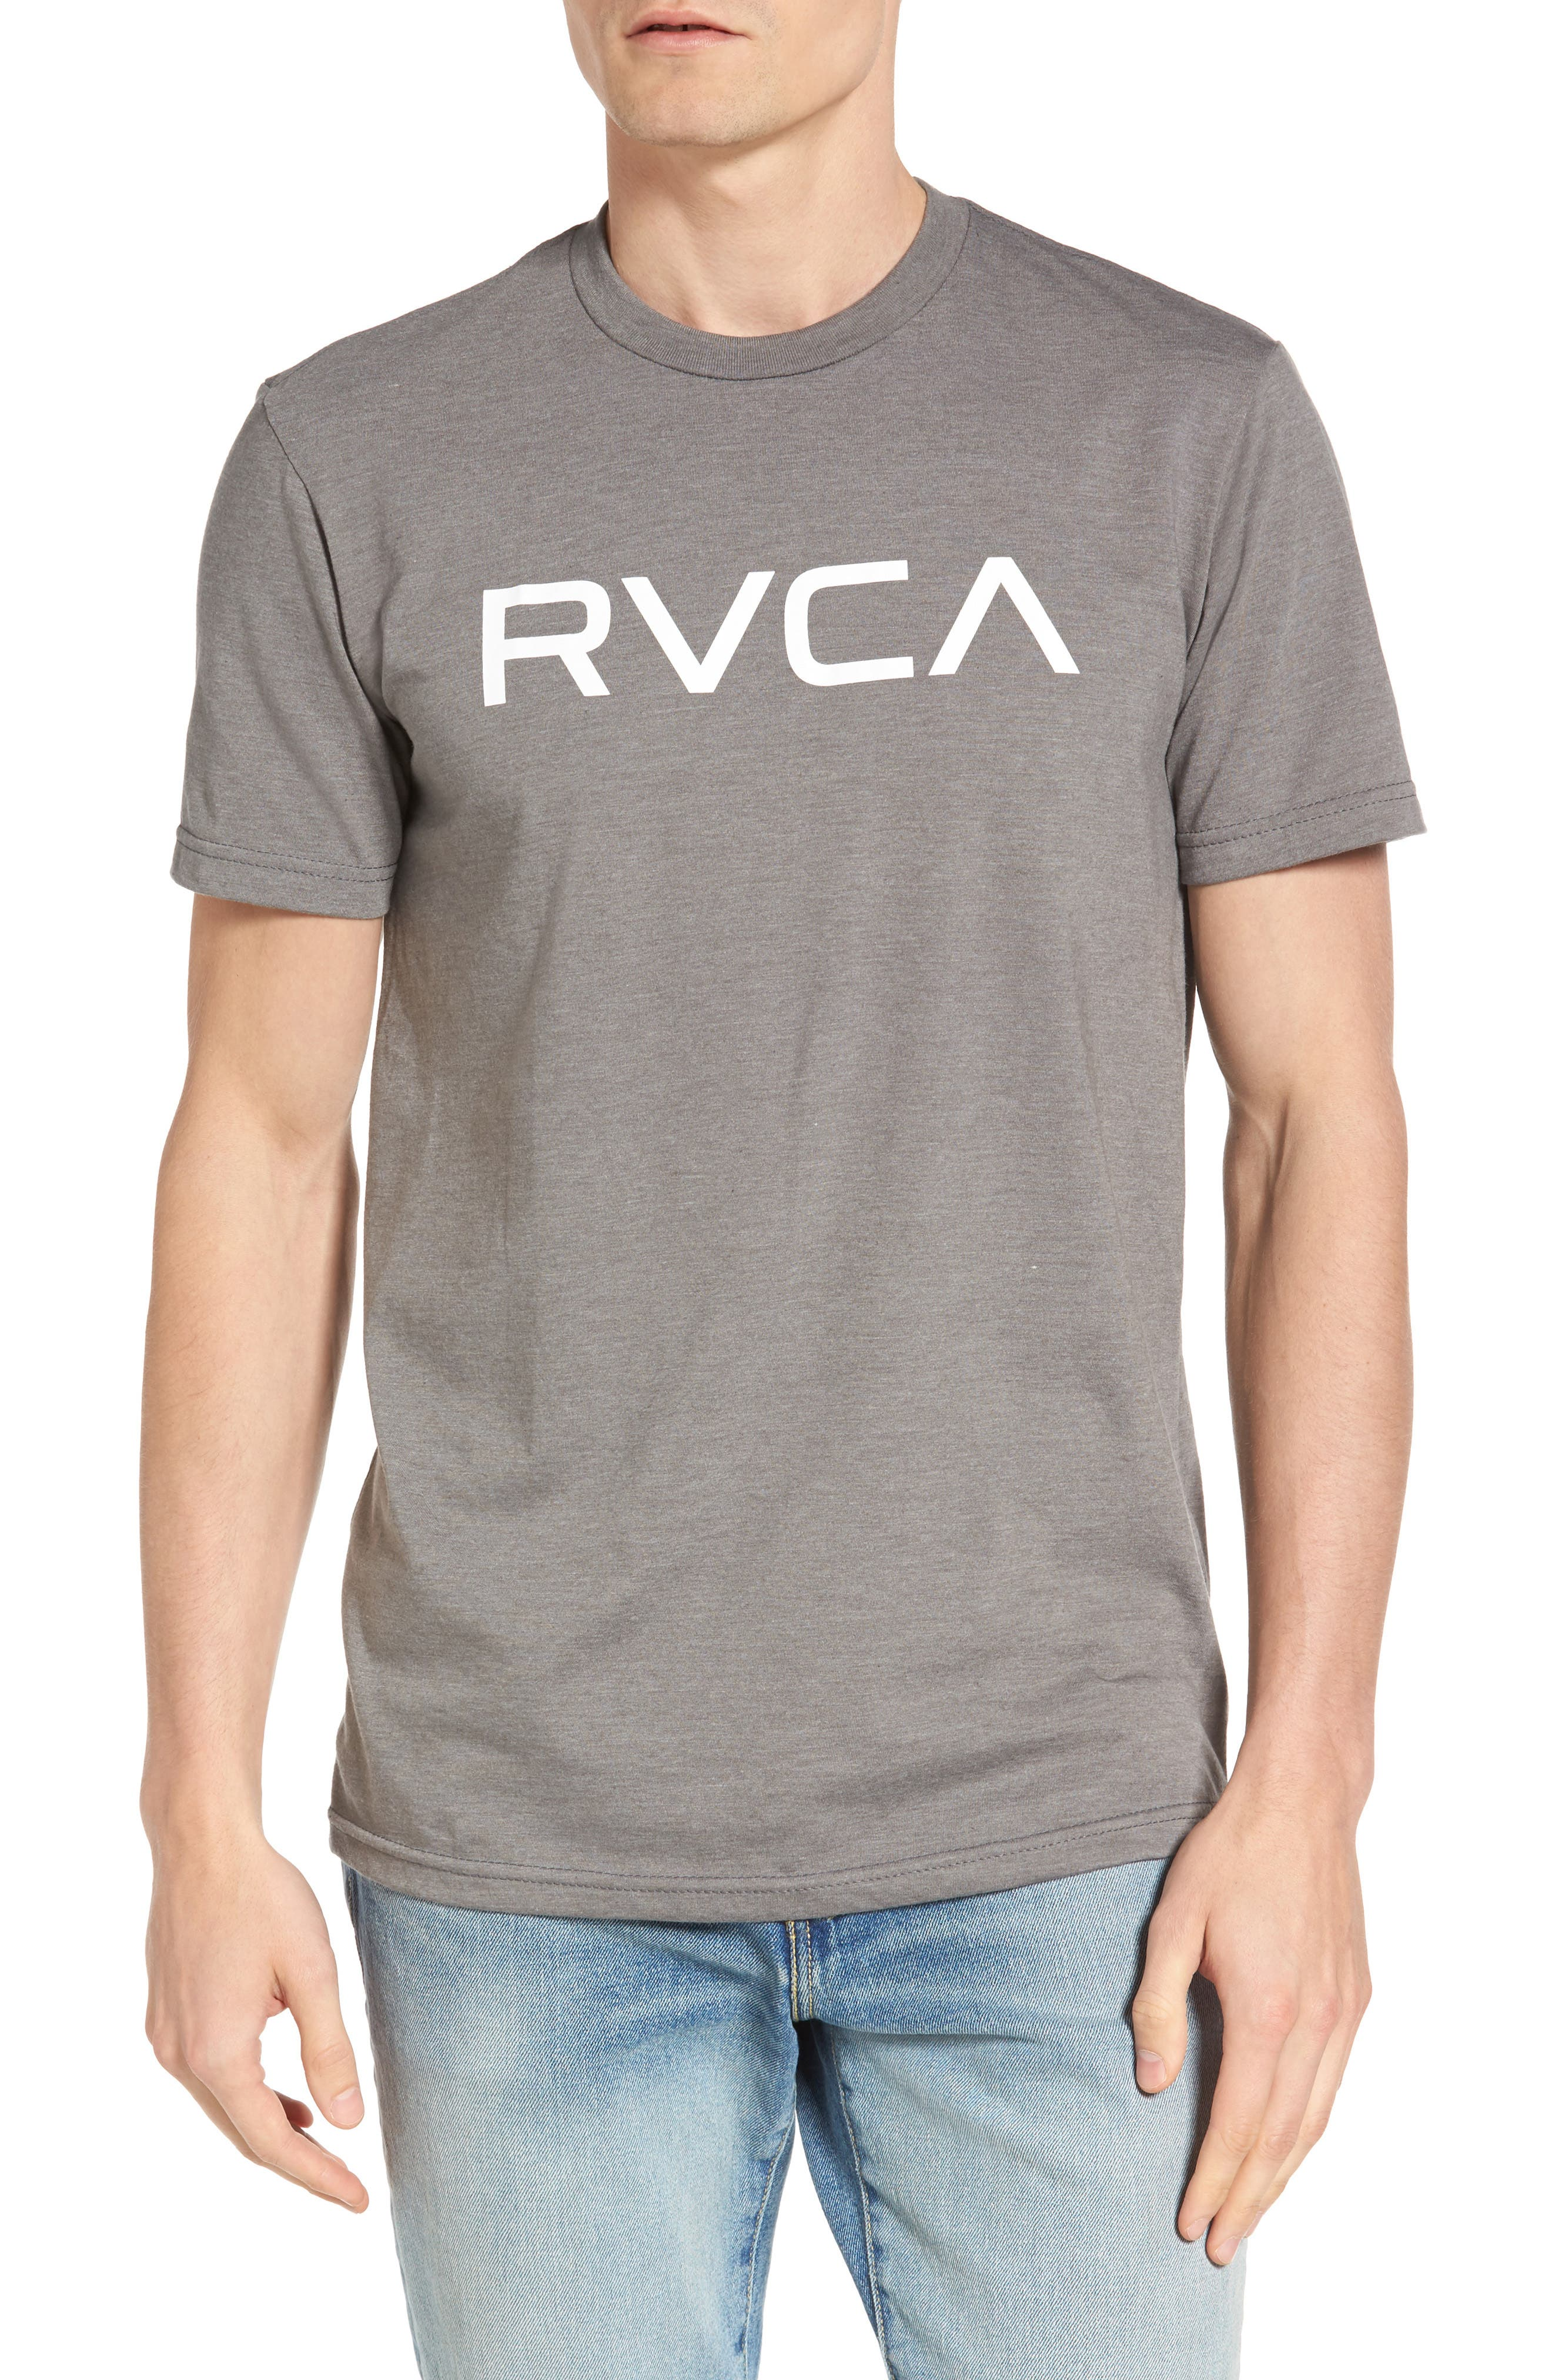 RVCA Big RVCA Graphic T-Shirt